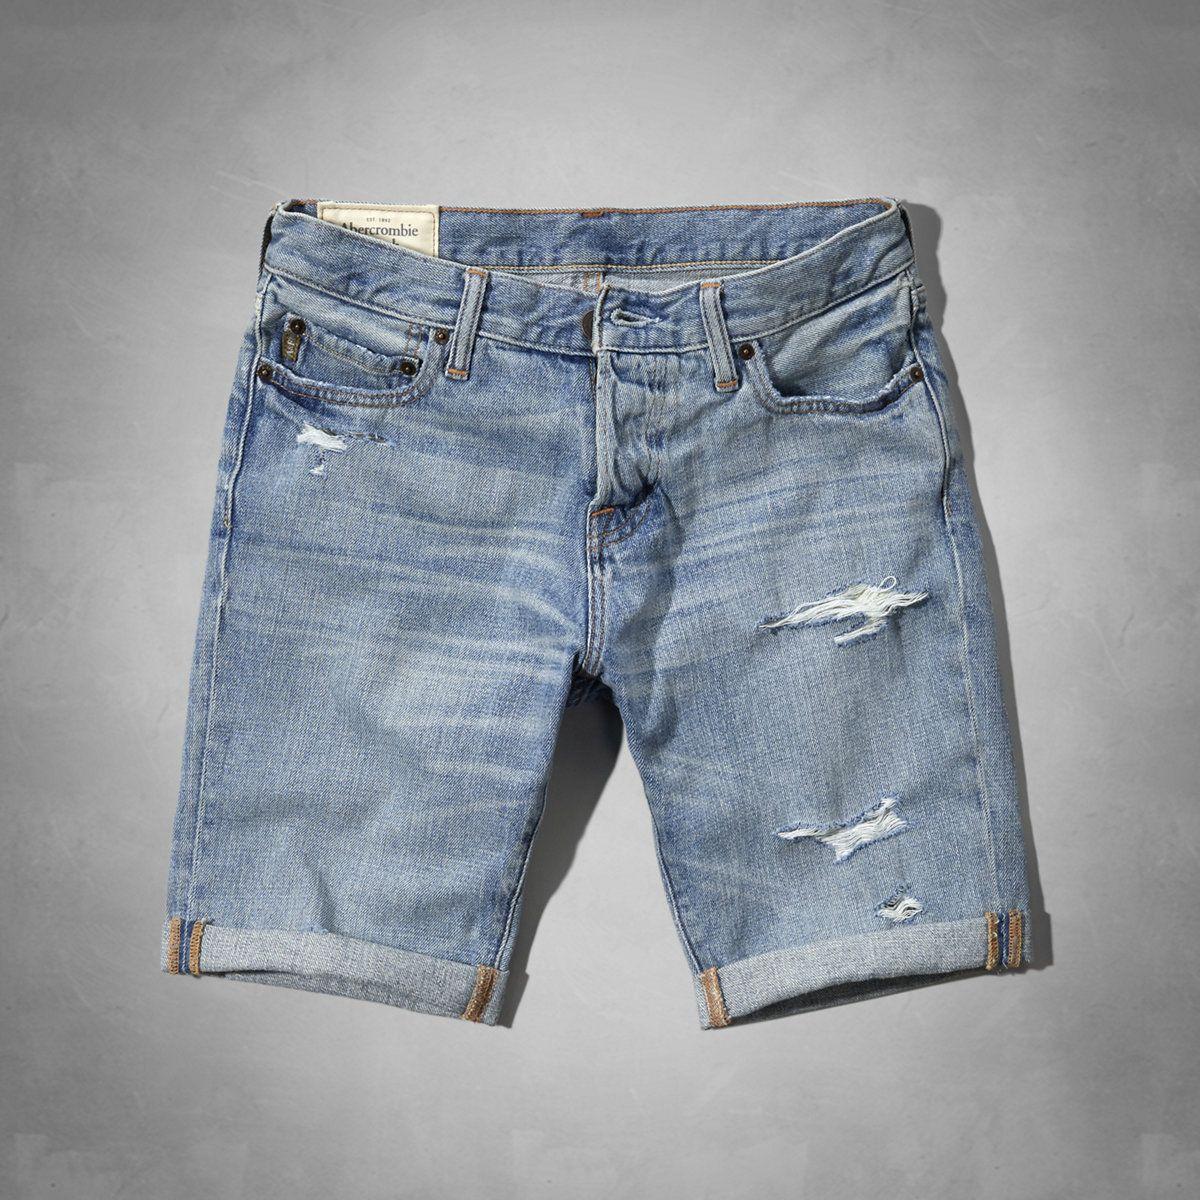 Flat-Front Shorts | Shorts and Guy fashion